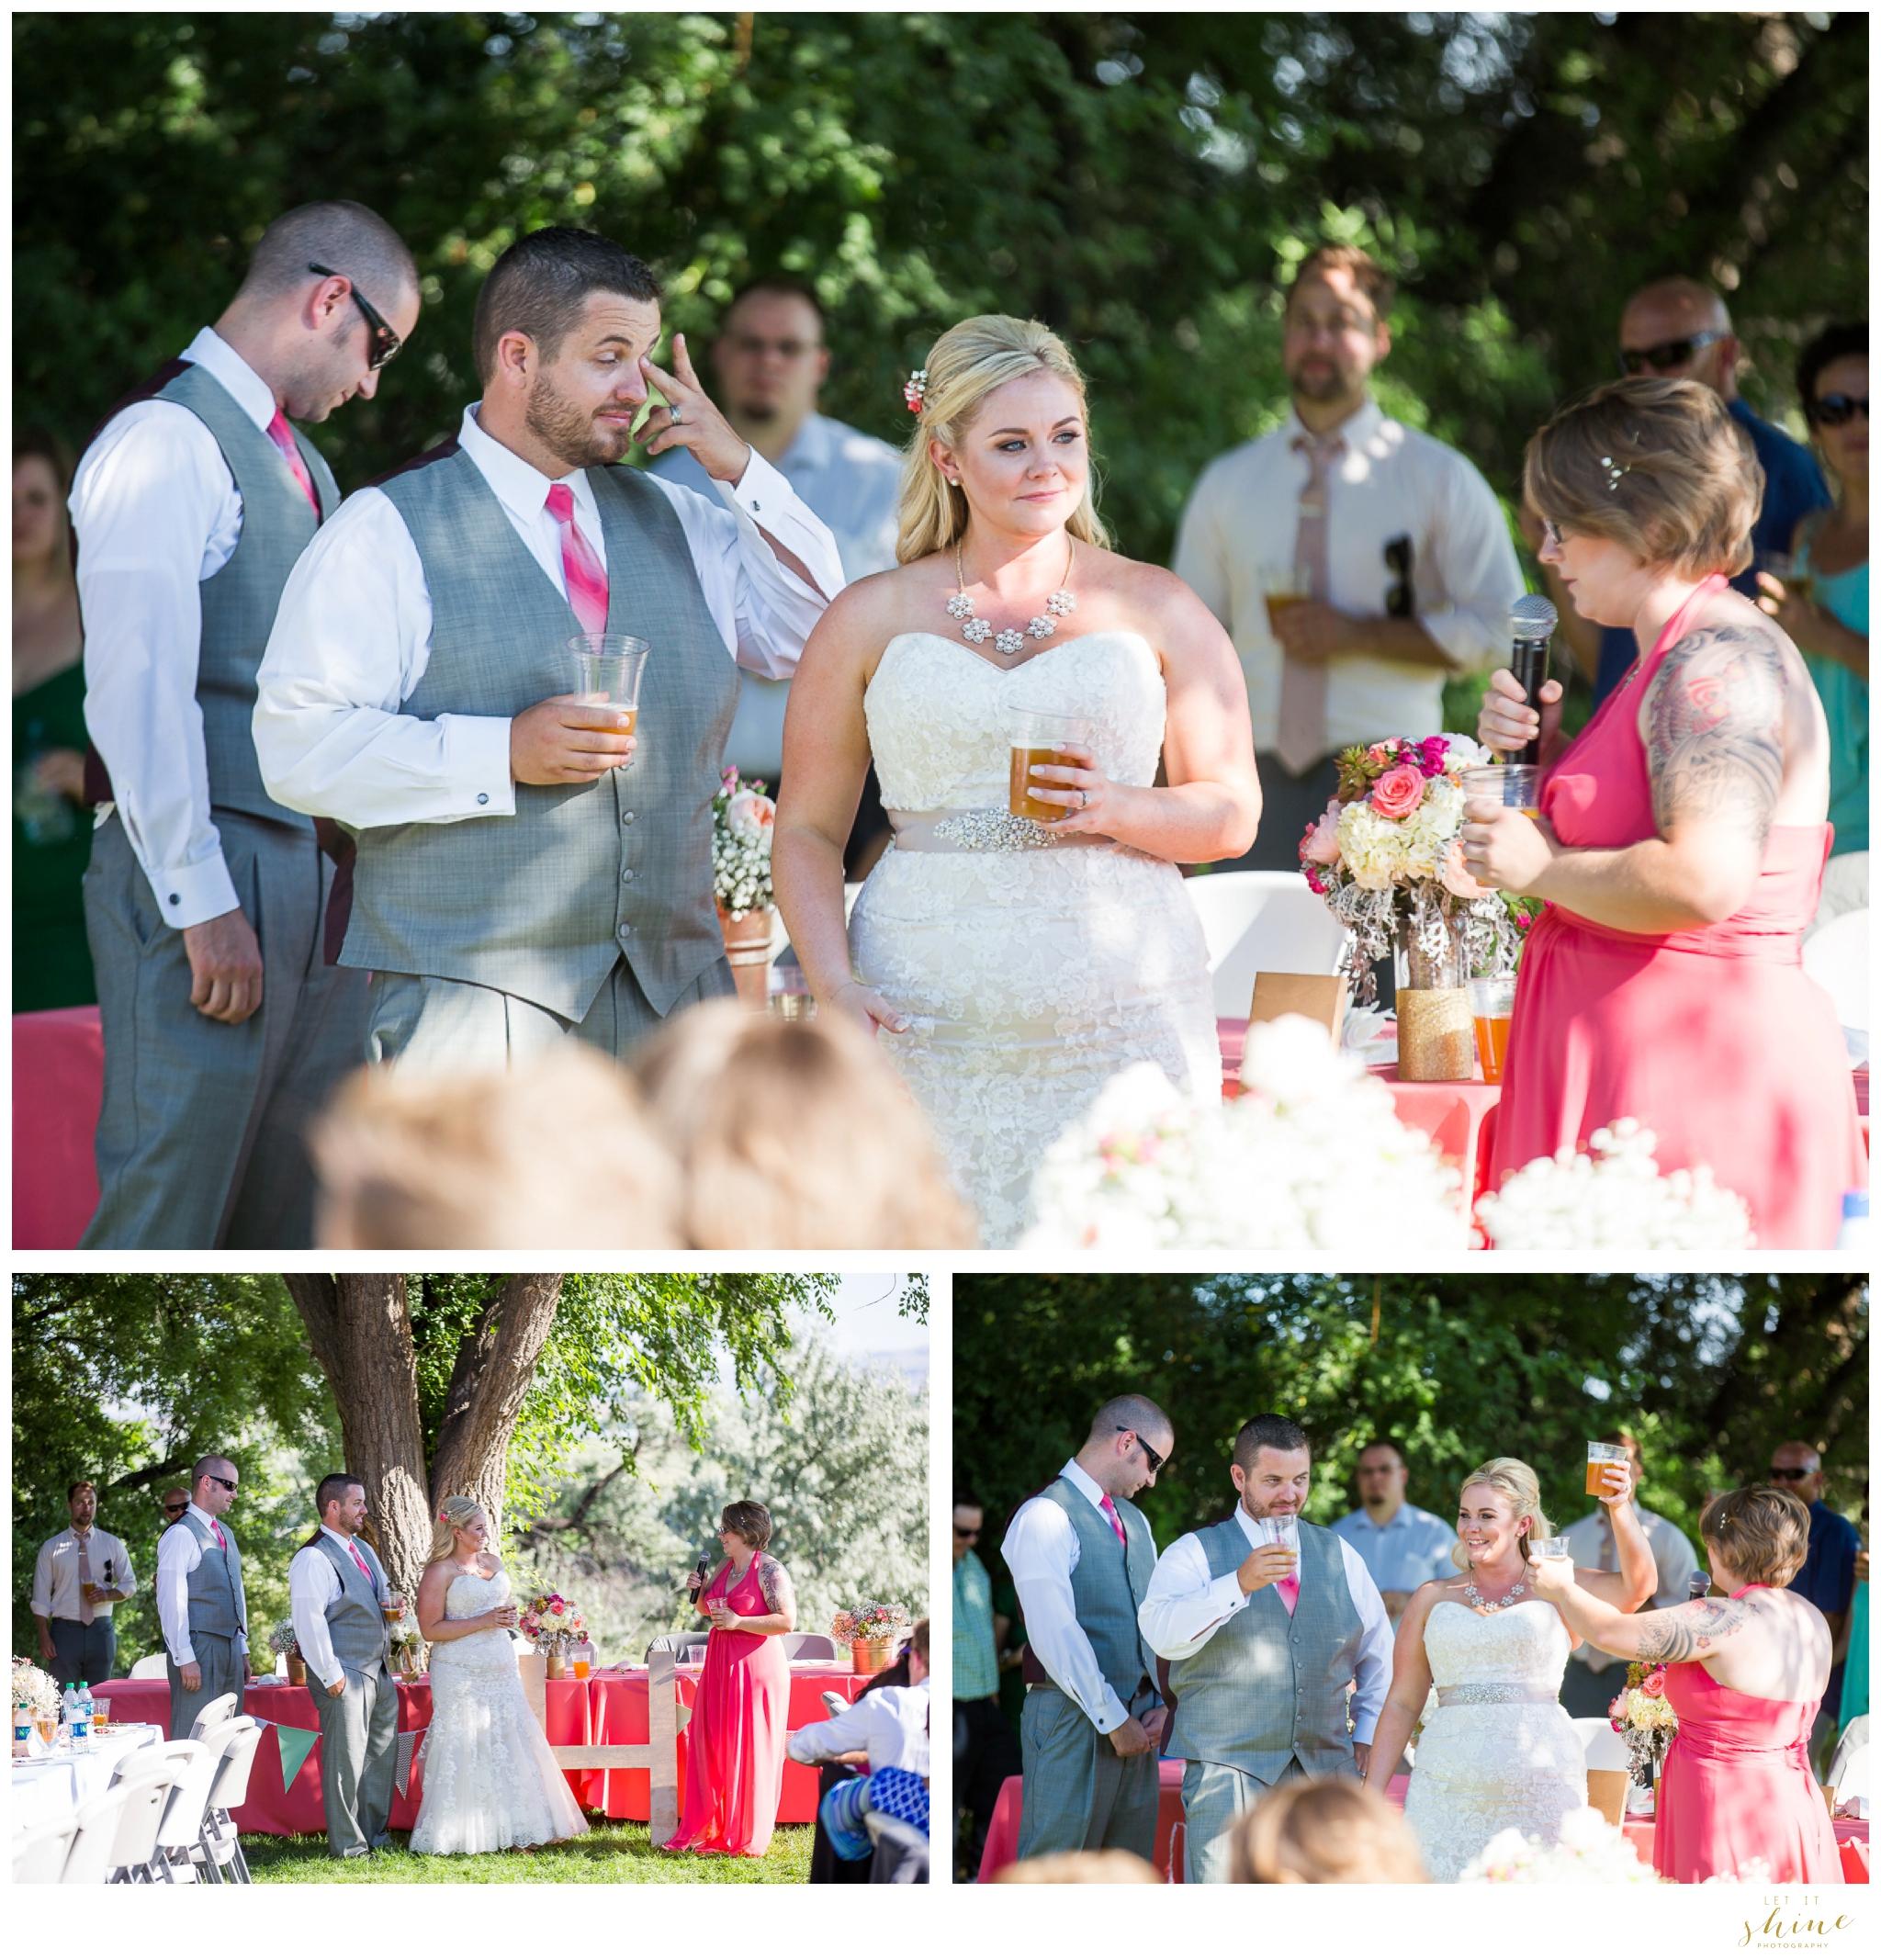 Wild Heart Springs Wedding Idaho Let it Shine Photography-63.jpg